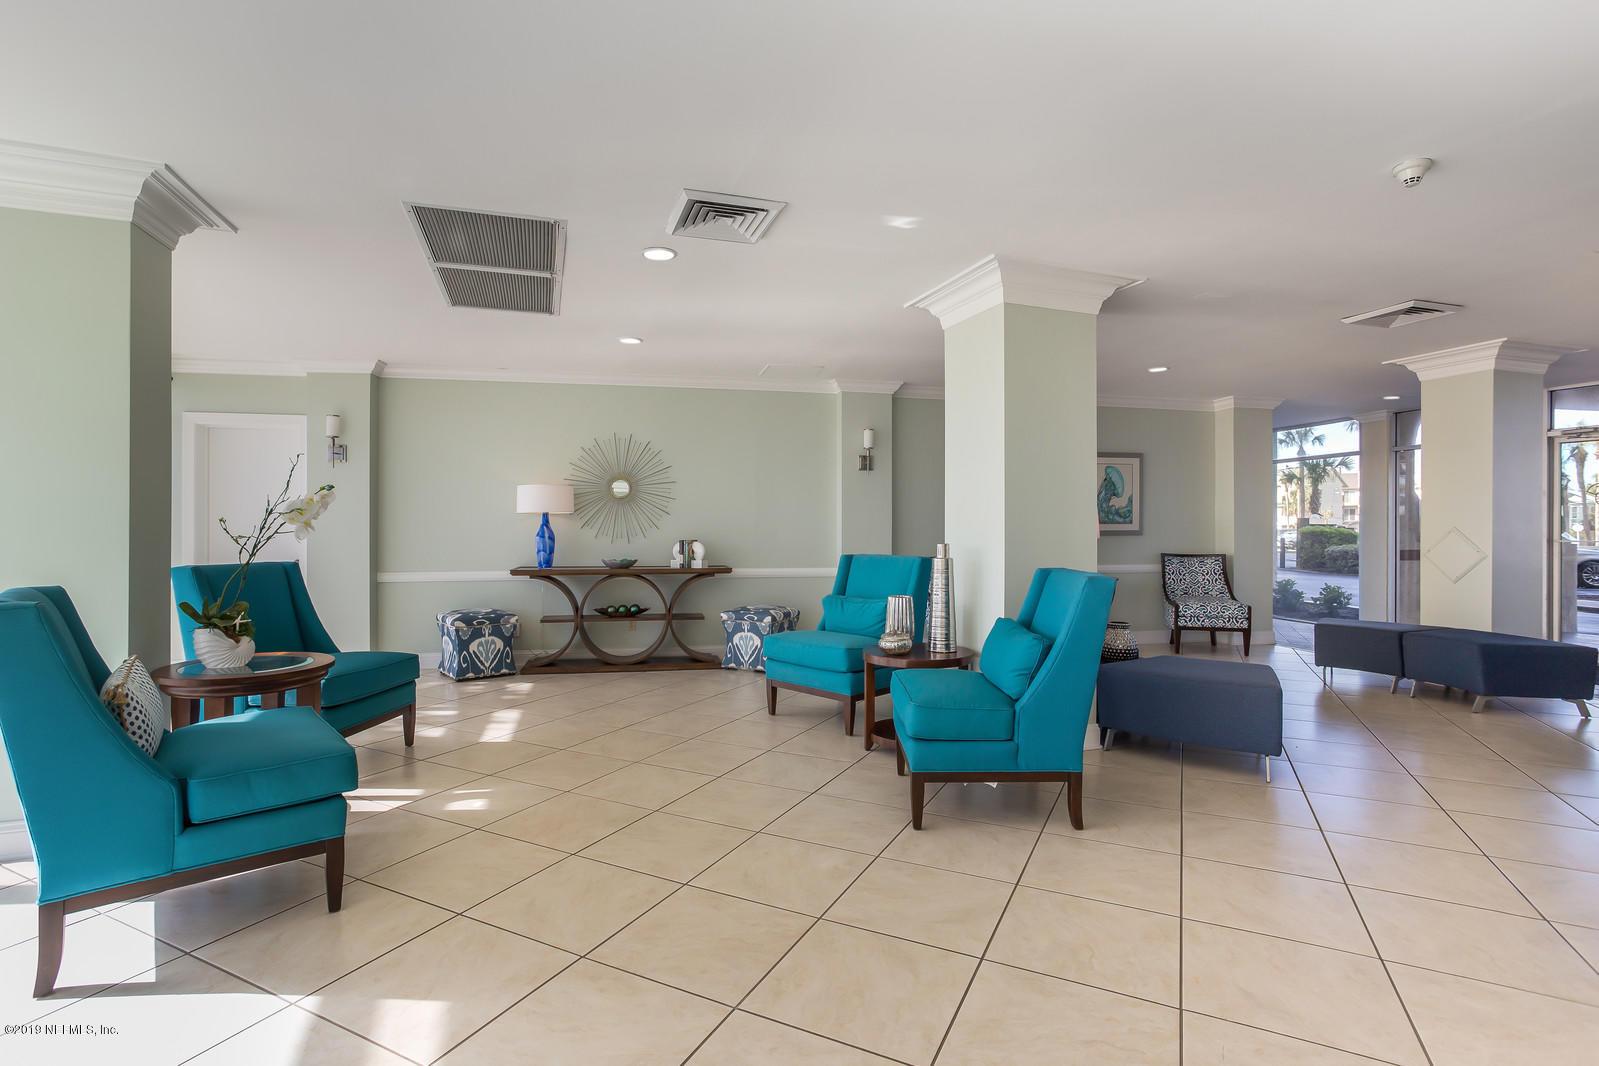 1601 OCEAN DR. S., JACKSONVILLE BEACH, FLORIDA 32250, 2 Bedrooms Bedrooms, ,2 BathroomsBathrooms,Residential - condos/townhomes,For sale,OCEAN DR. S.,981507